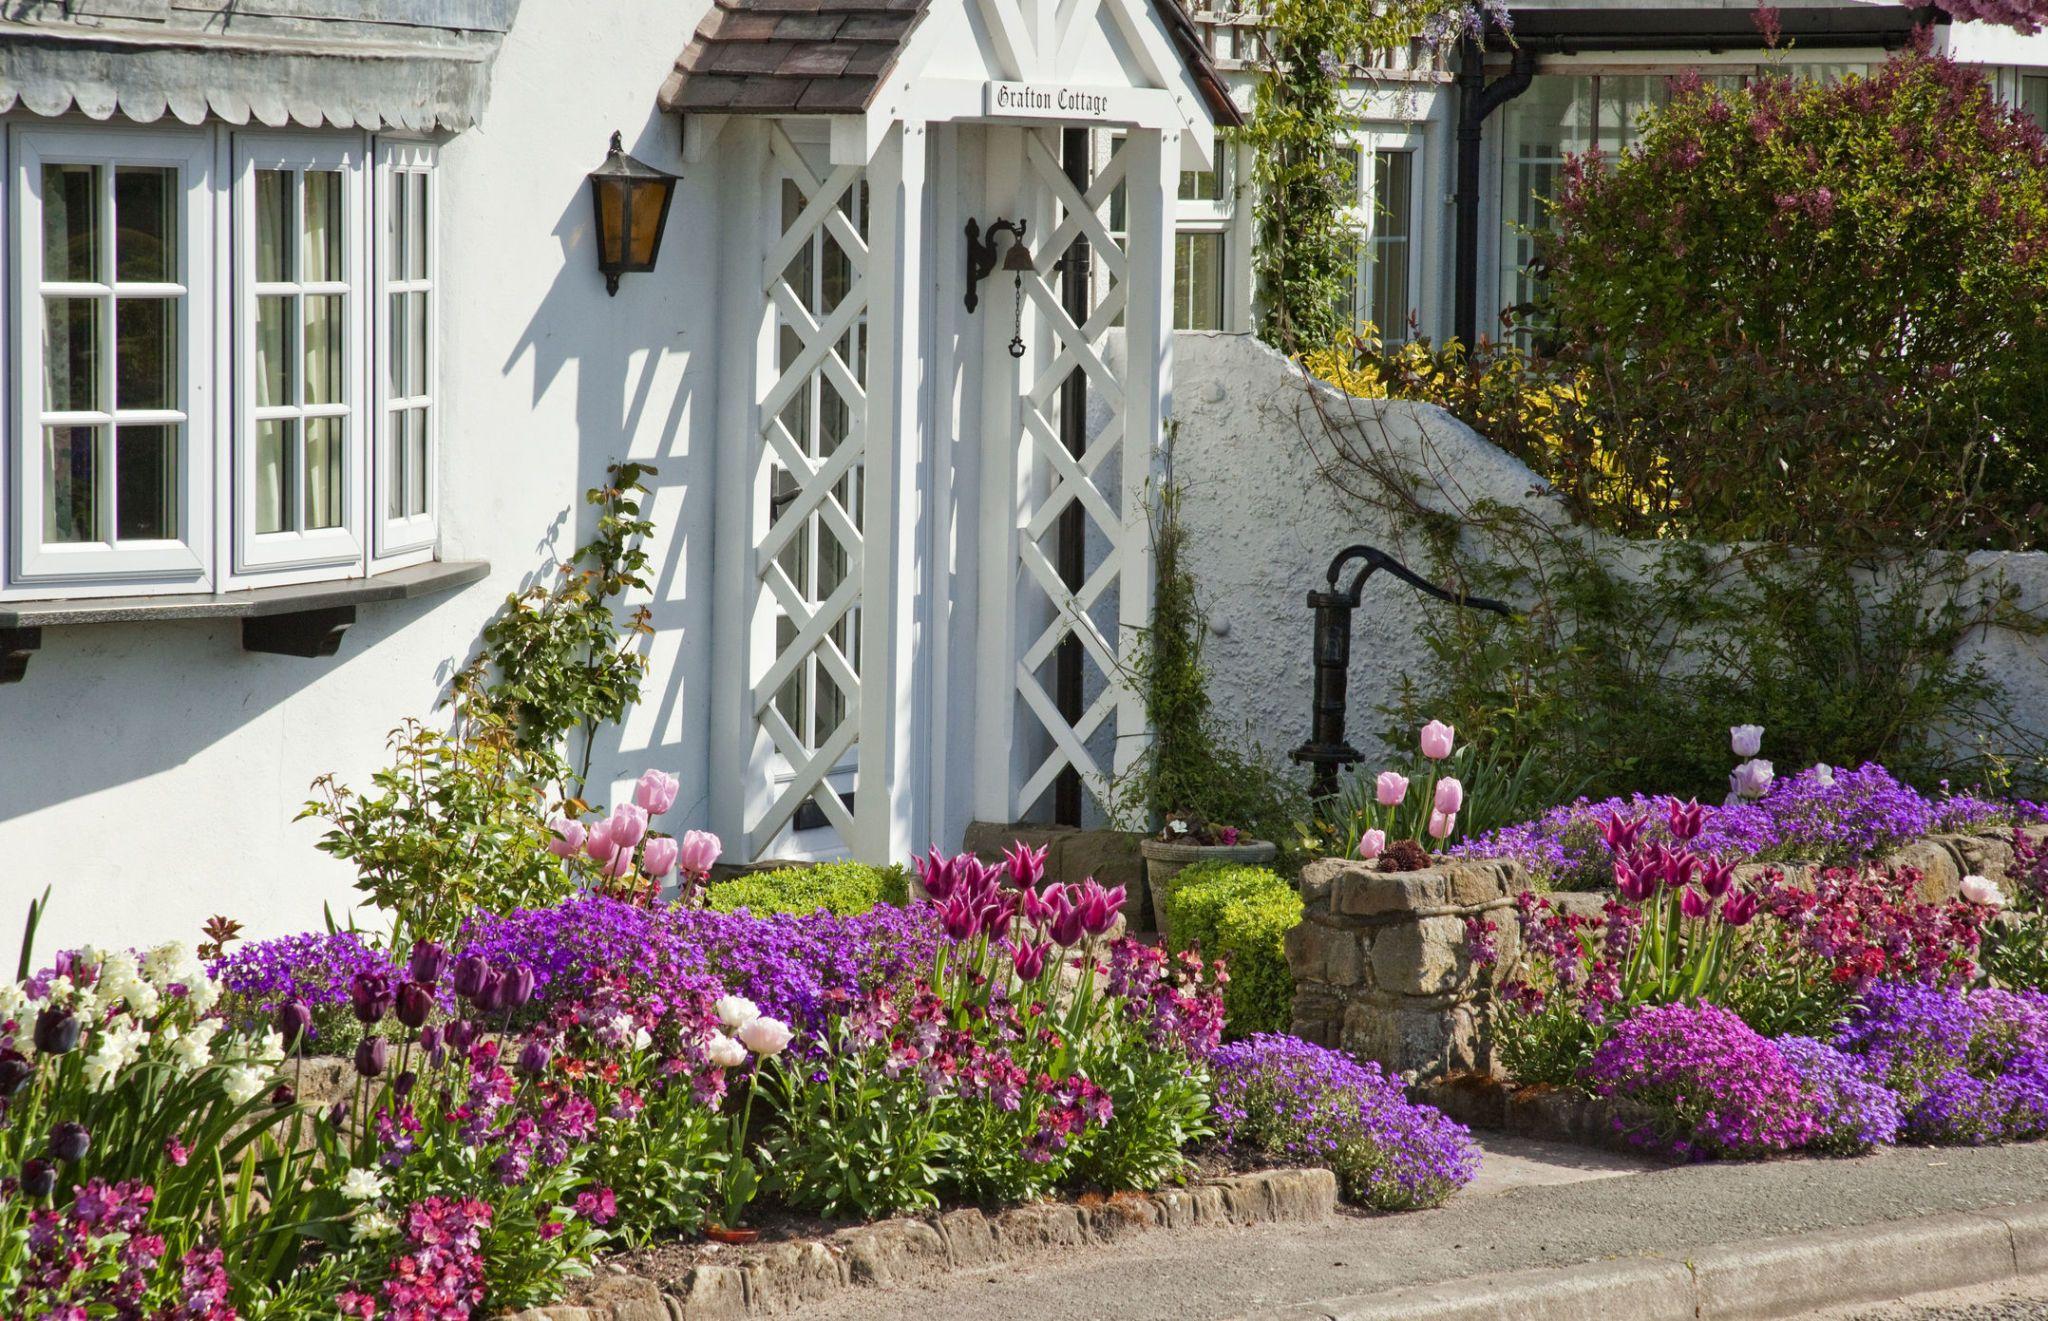 Attractive Spring Flowering Cottage Front Garden, Staffordshire, UK